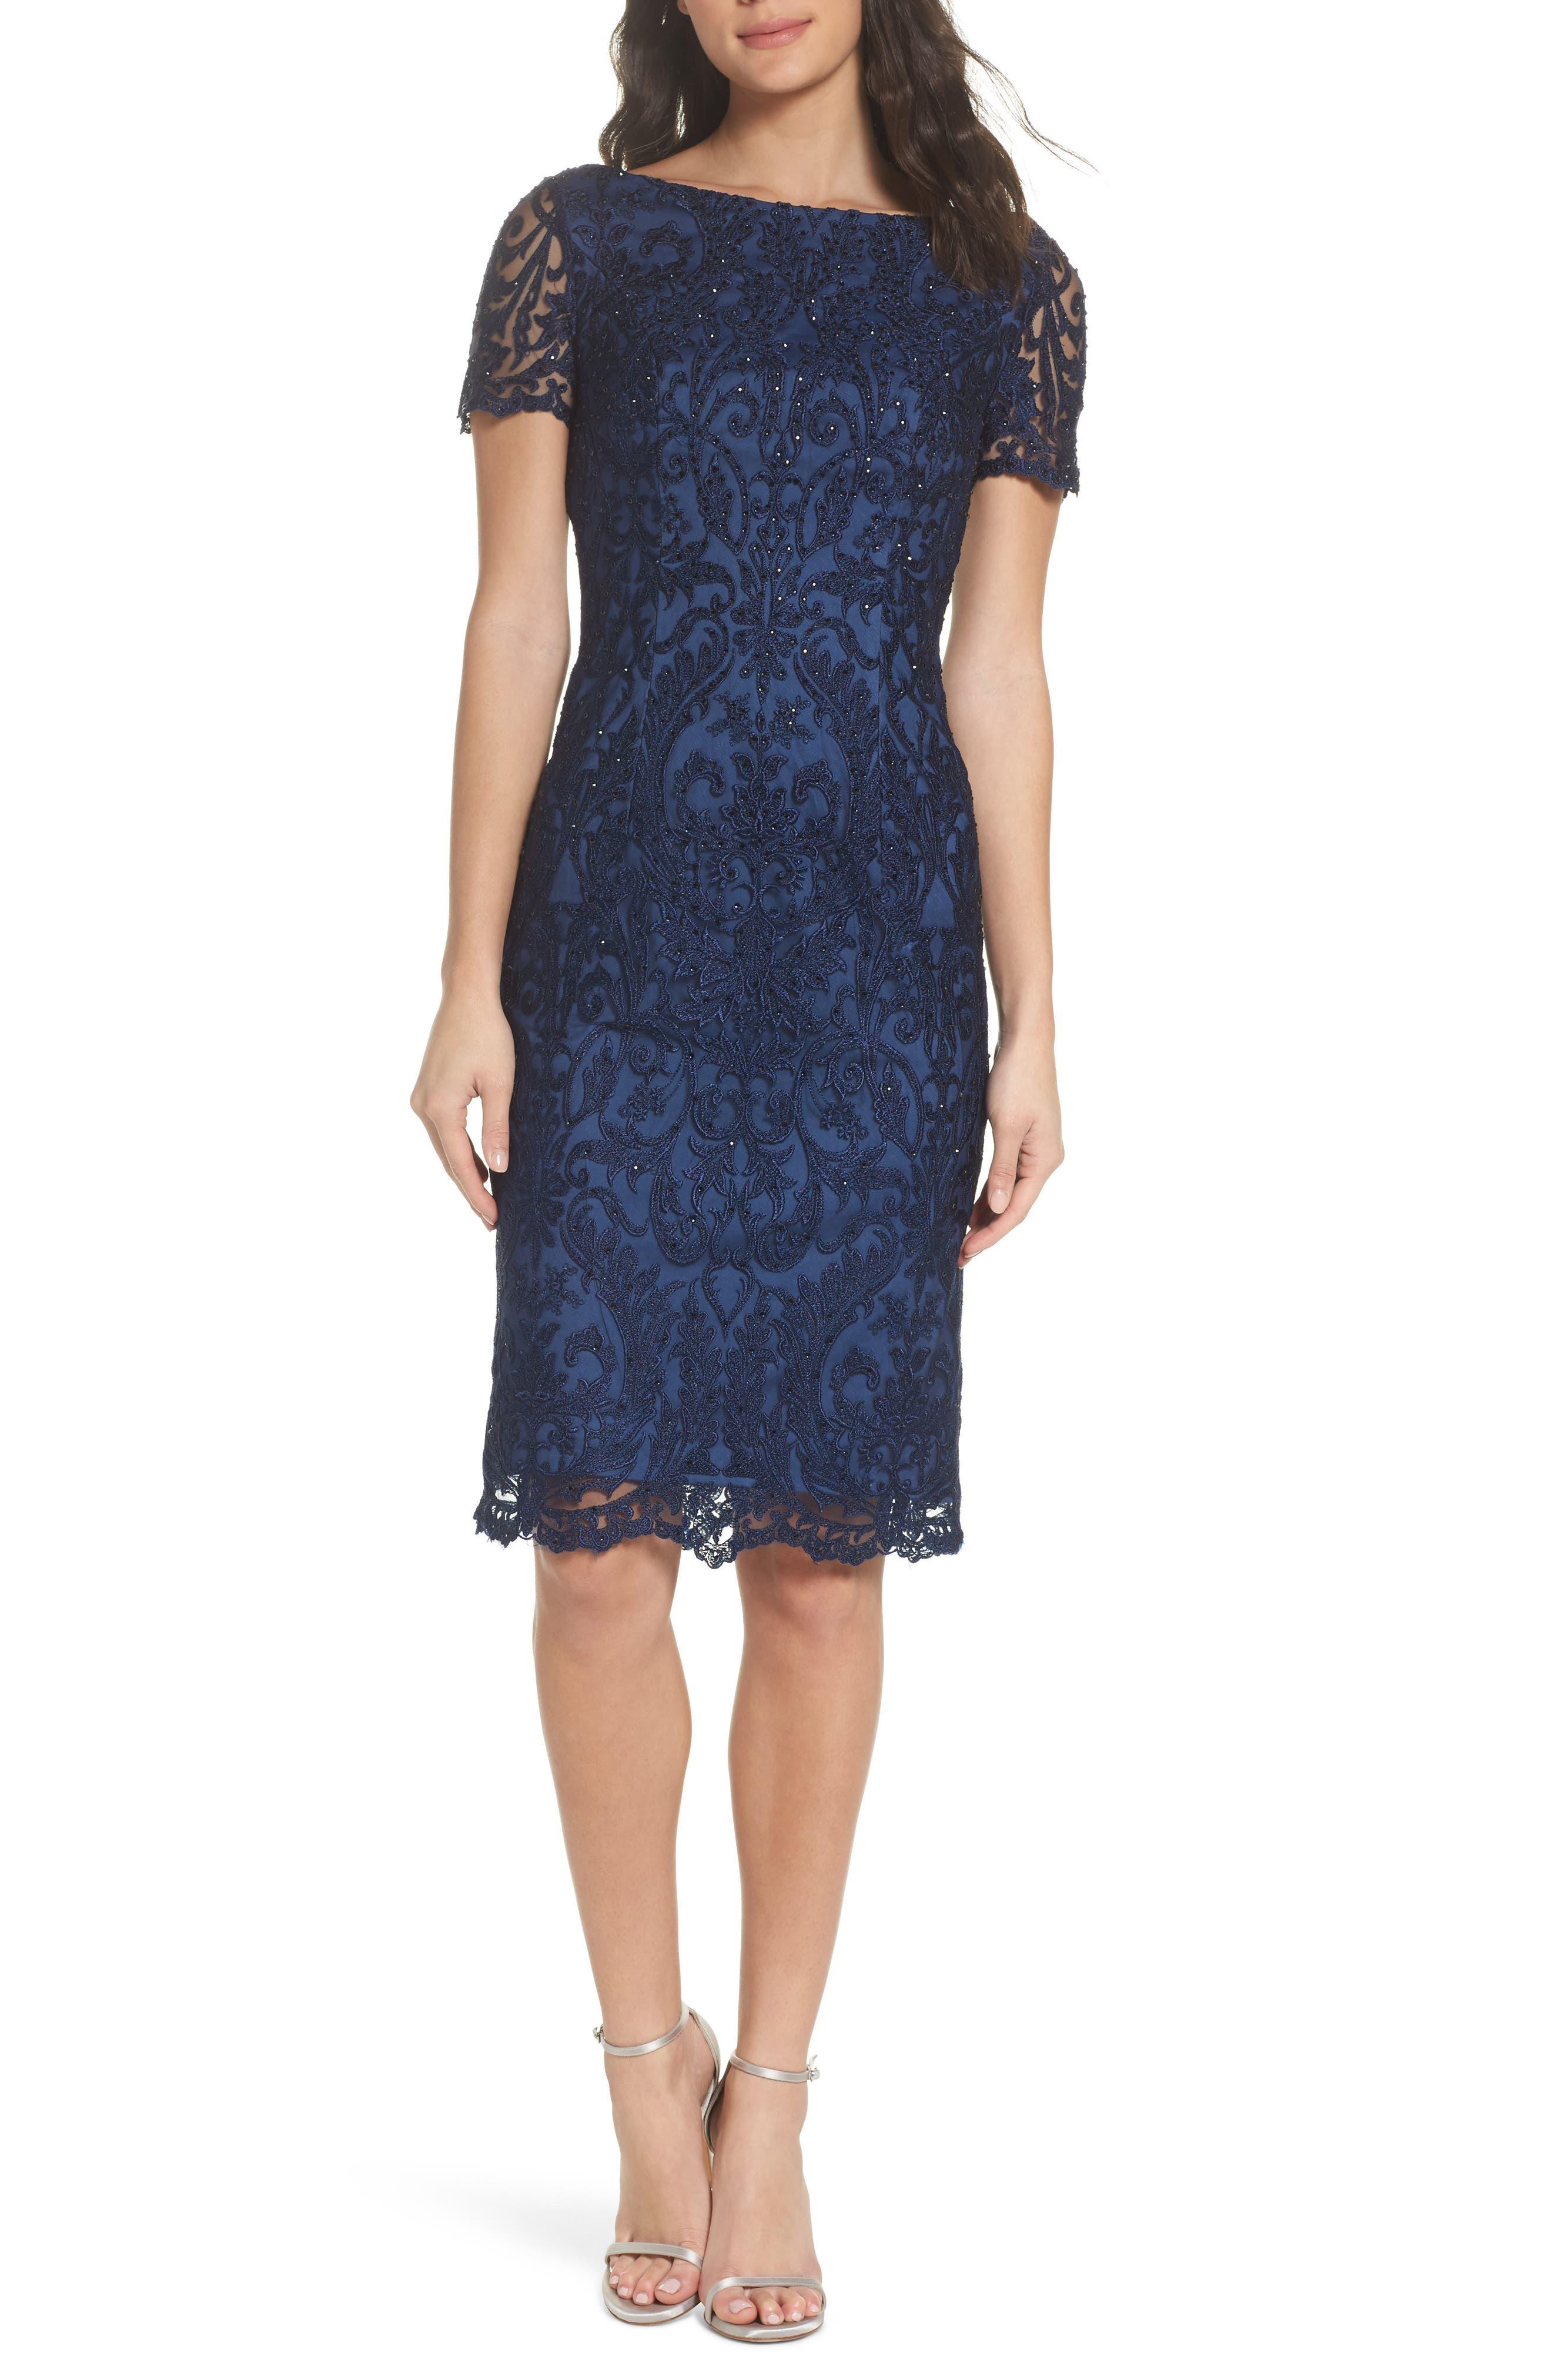 La Femme Beaded Lace Sheath Dress, Blue